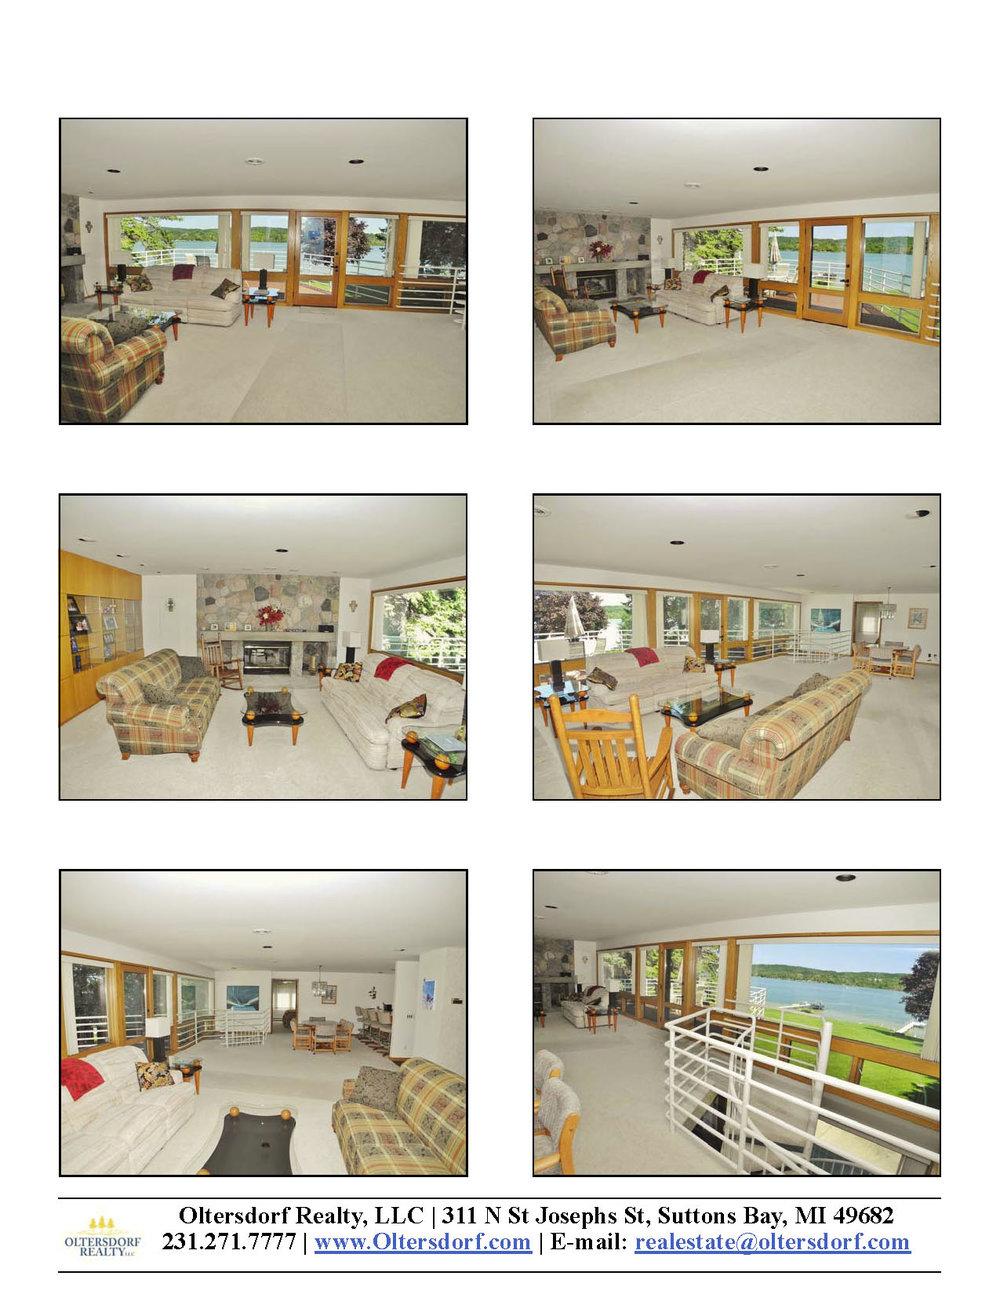 2091 S Lake Shore Drive - Oltersdorf Realty LLC Marketing Packet_Page_04.jpg